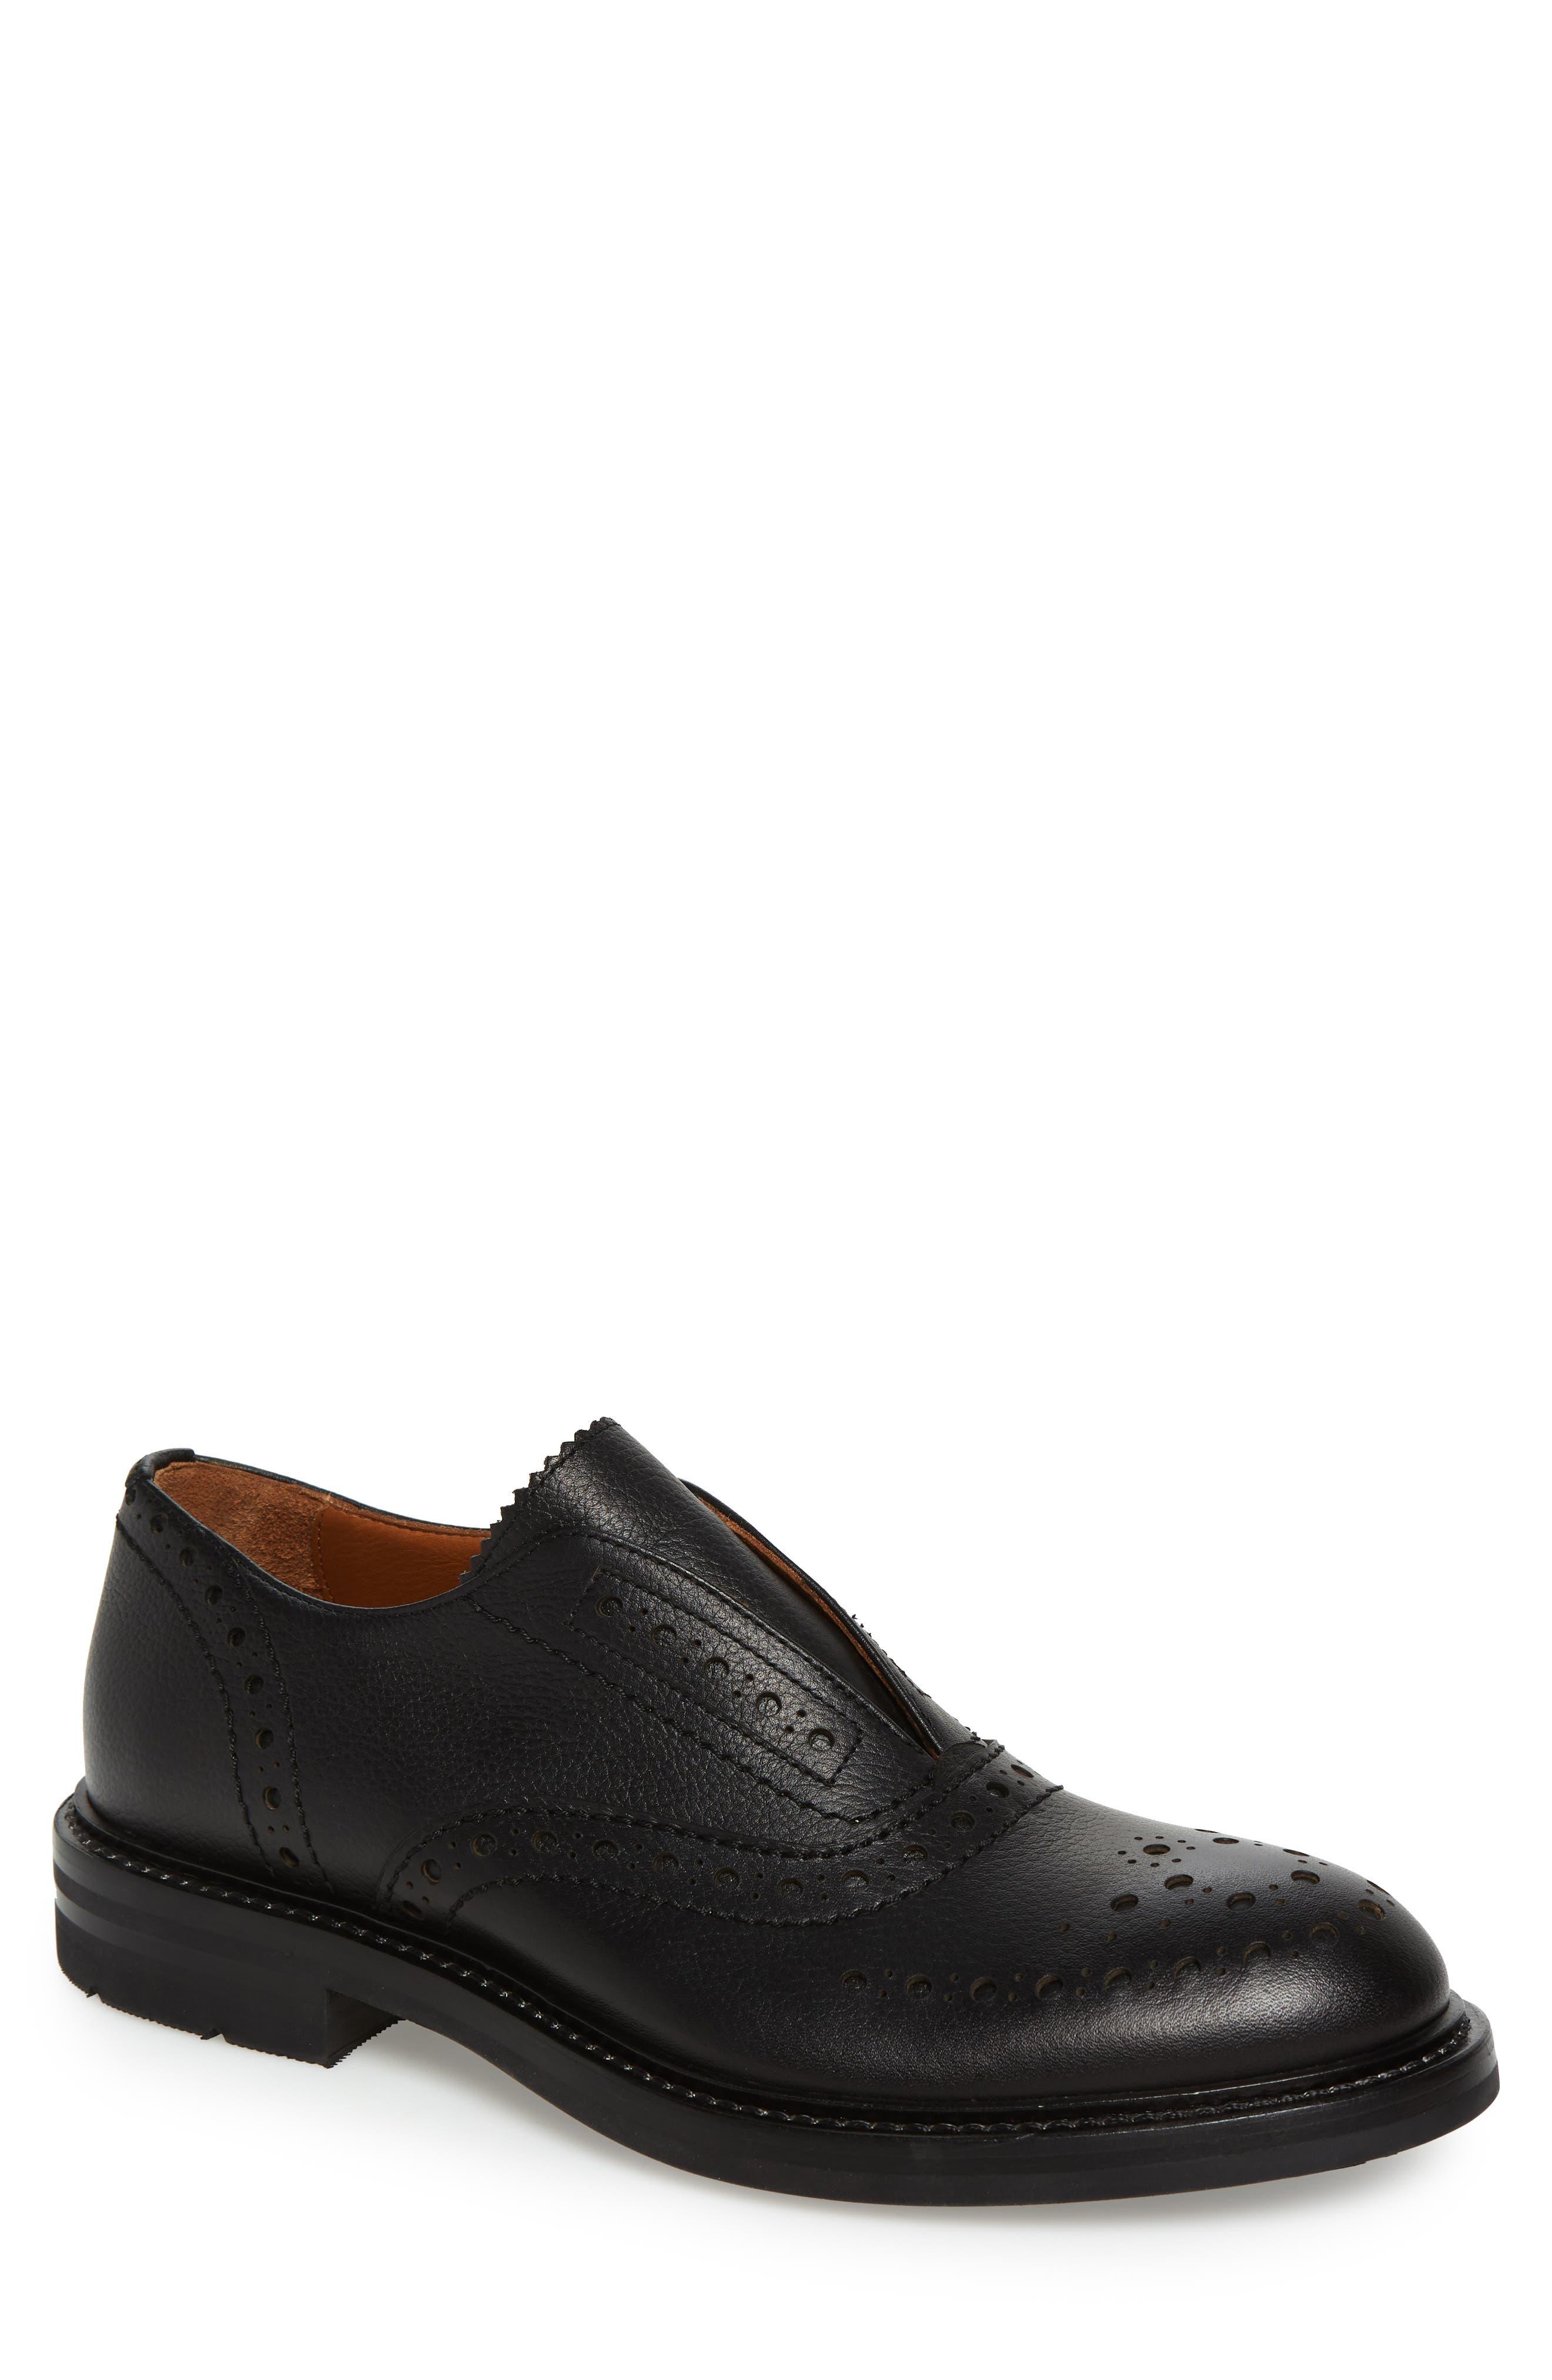 Romeo Weatherproof Laceless Oxford,                             Main thumbnail 1, color,                             Black Leather